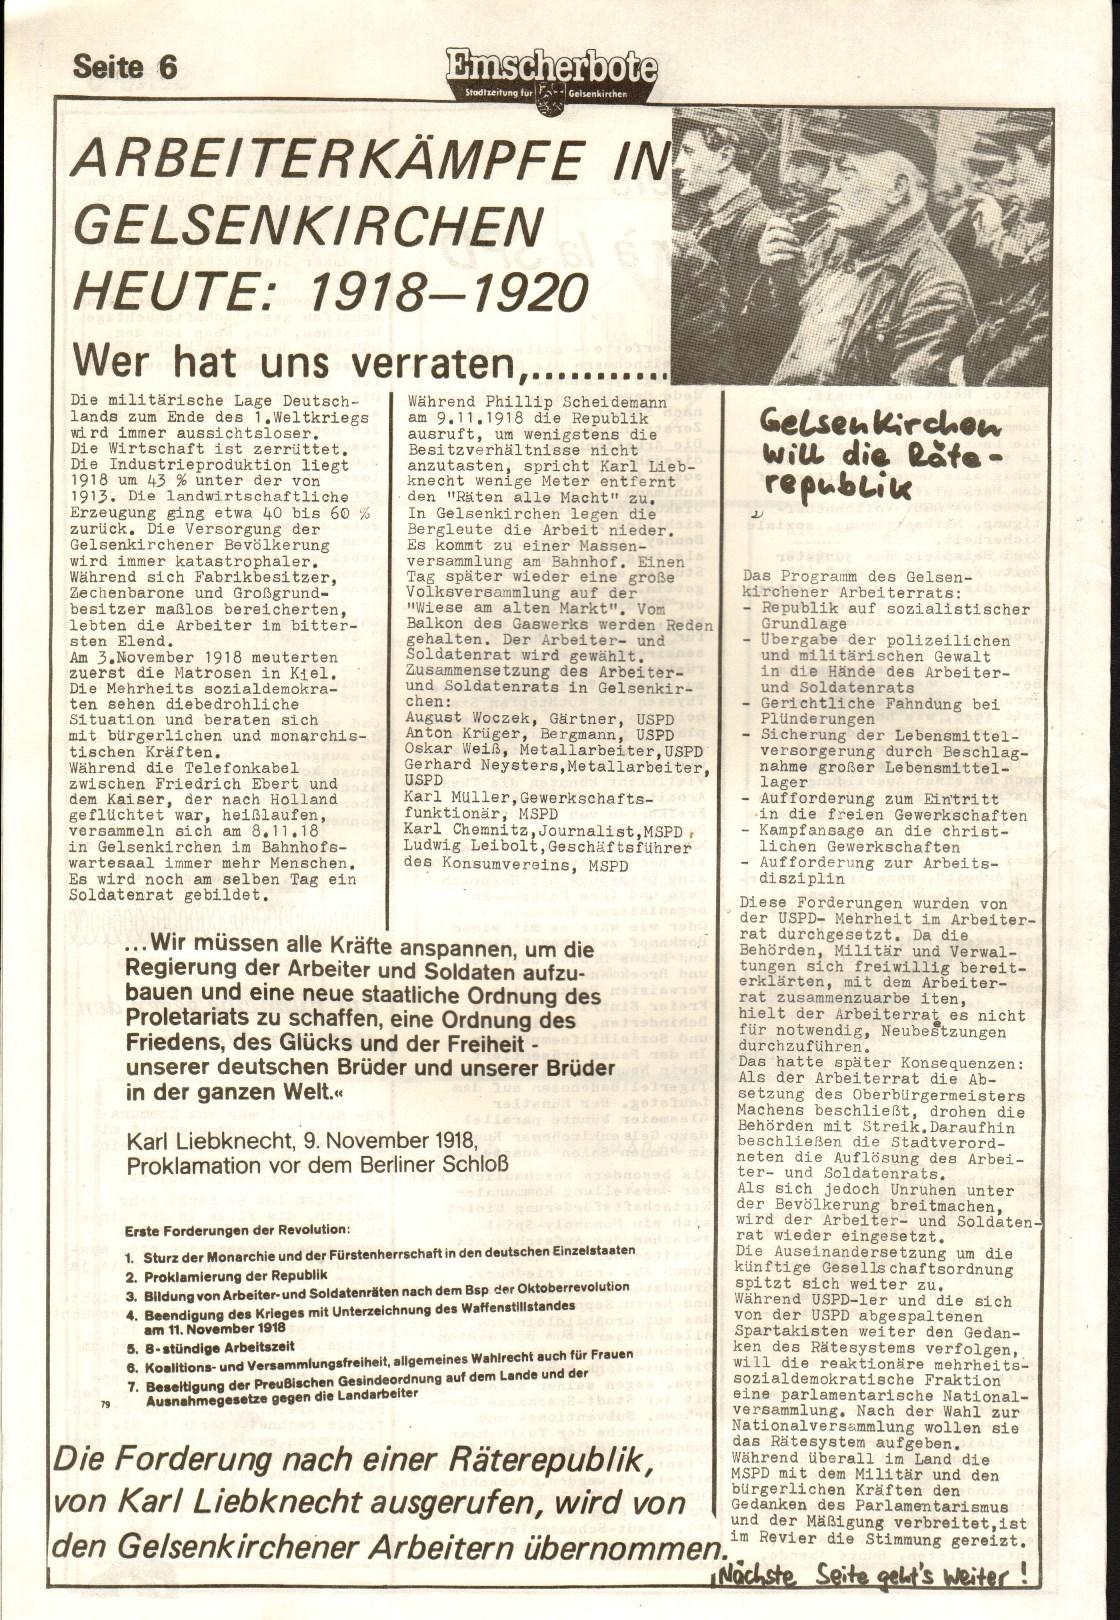 Gelsenkirchen_Emscherbote_1981_08_06